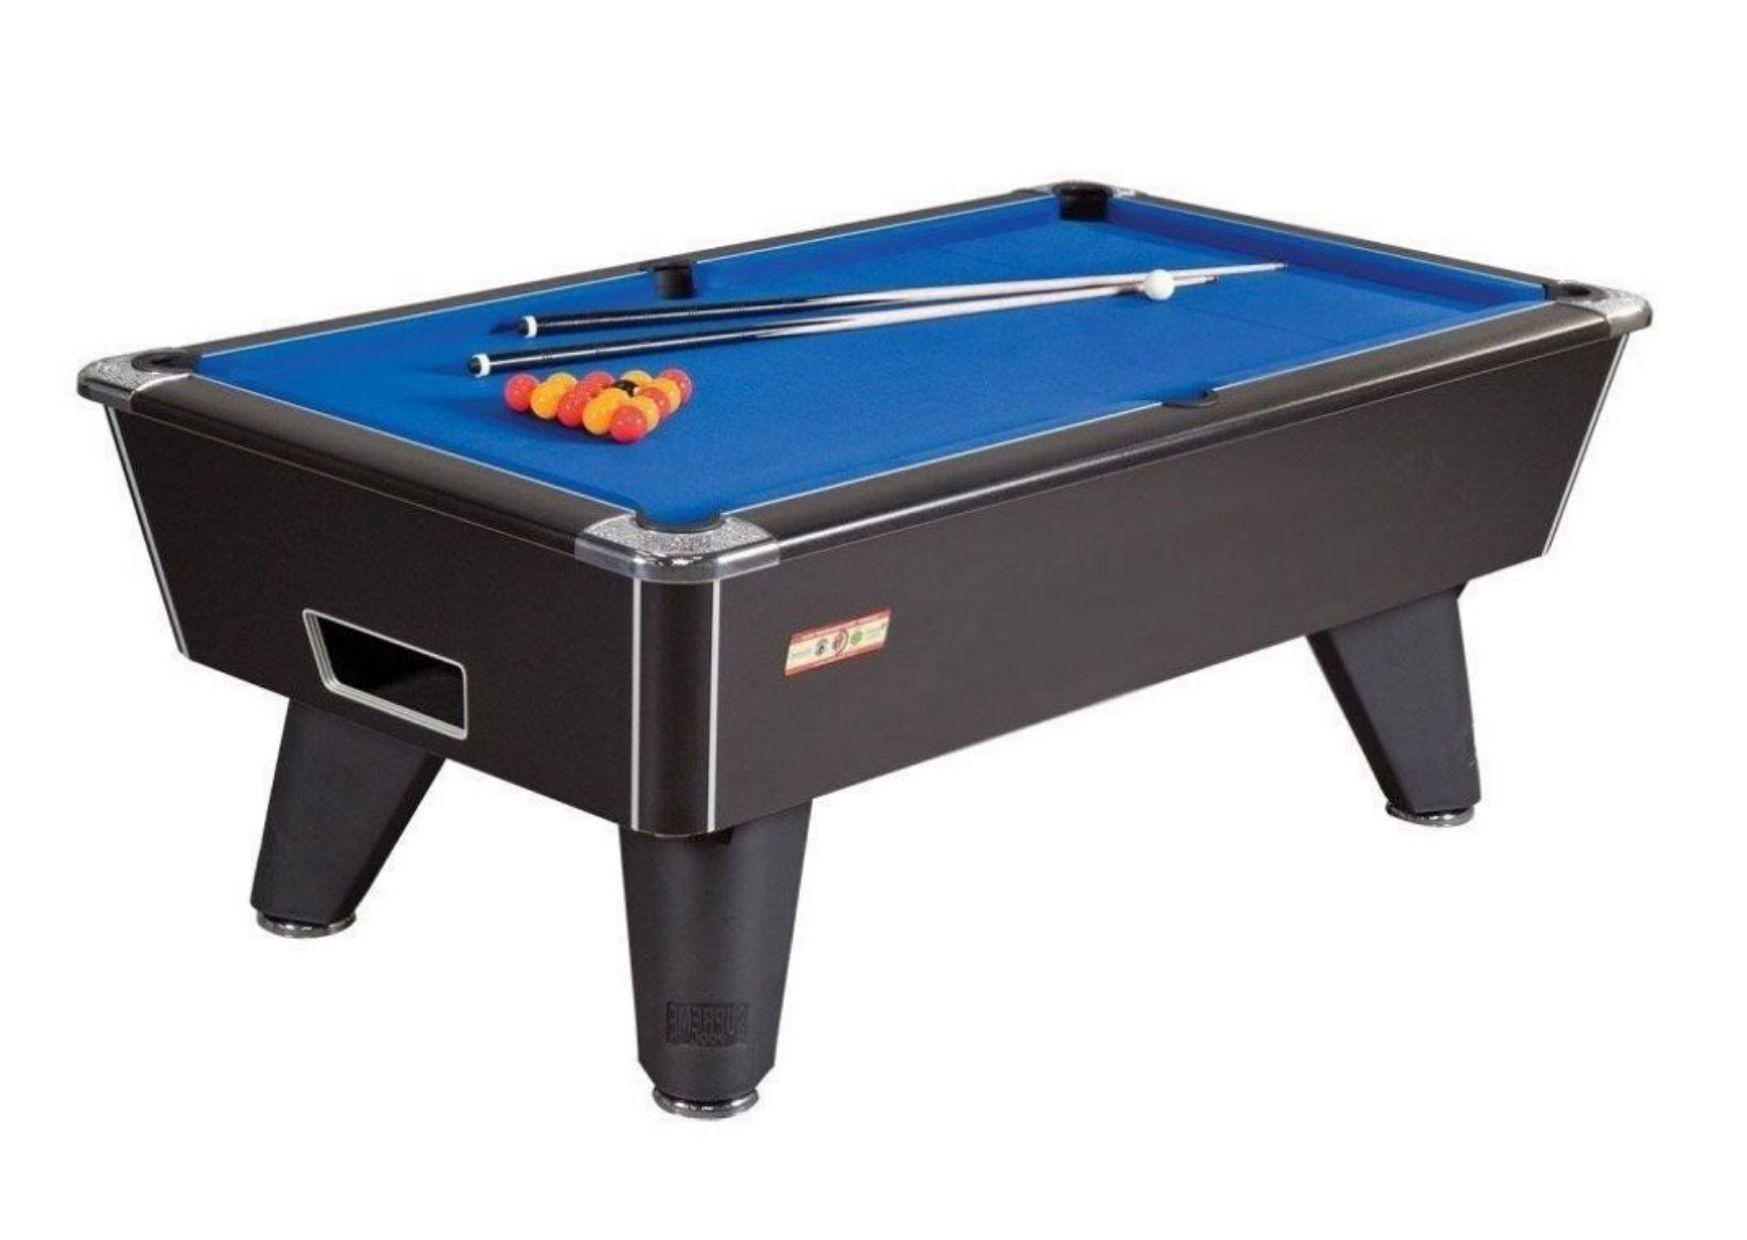 New Sherlock Pool Table